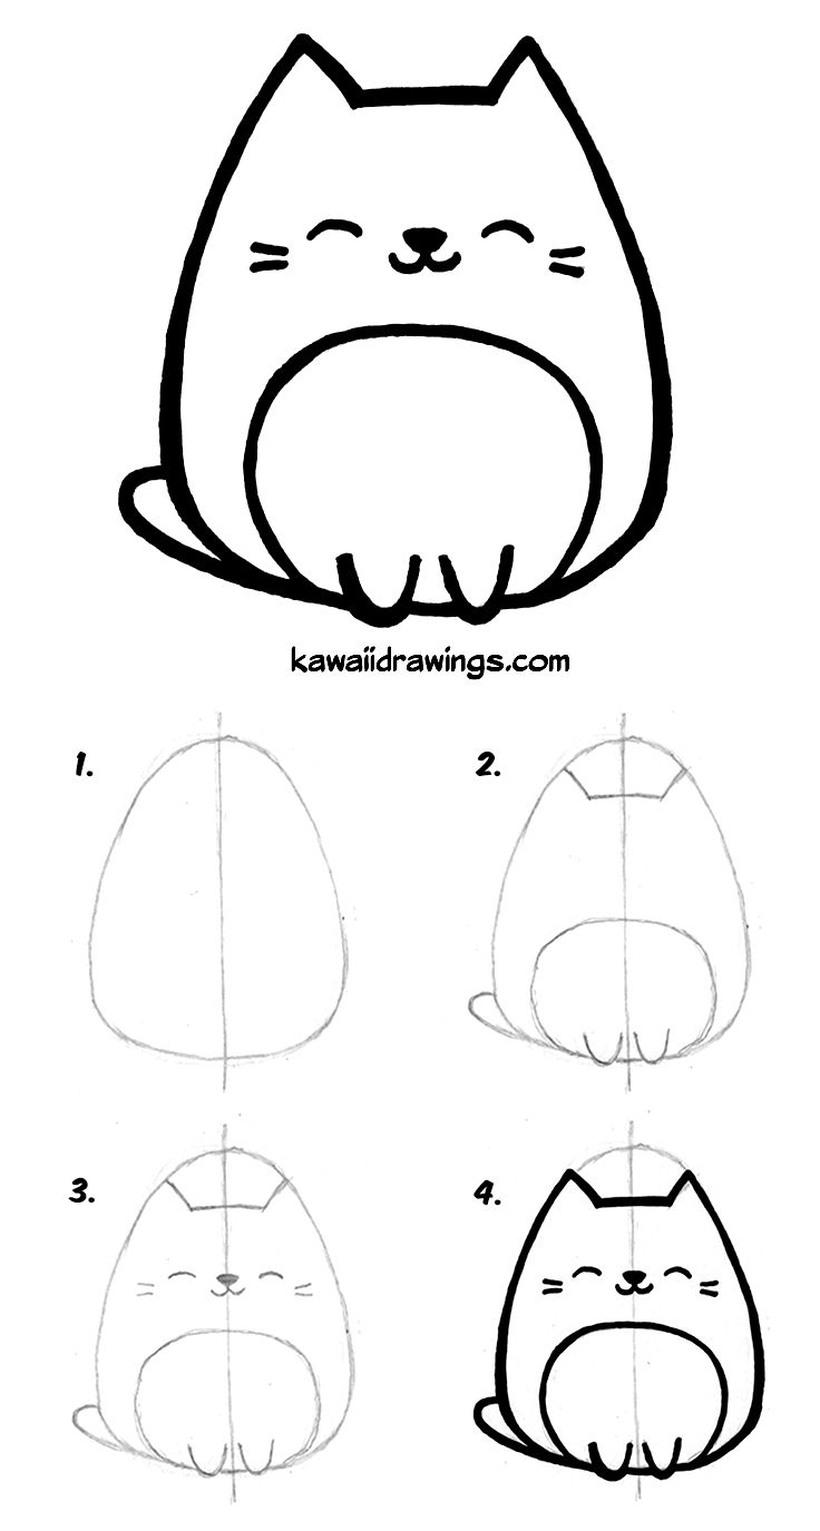 gatos gato dibujos faciles kawaii para niños simples a lápiz gatito feliz